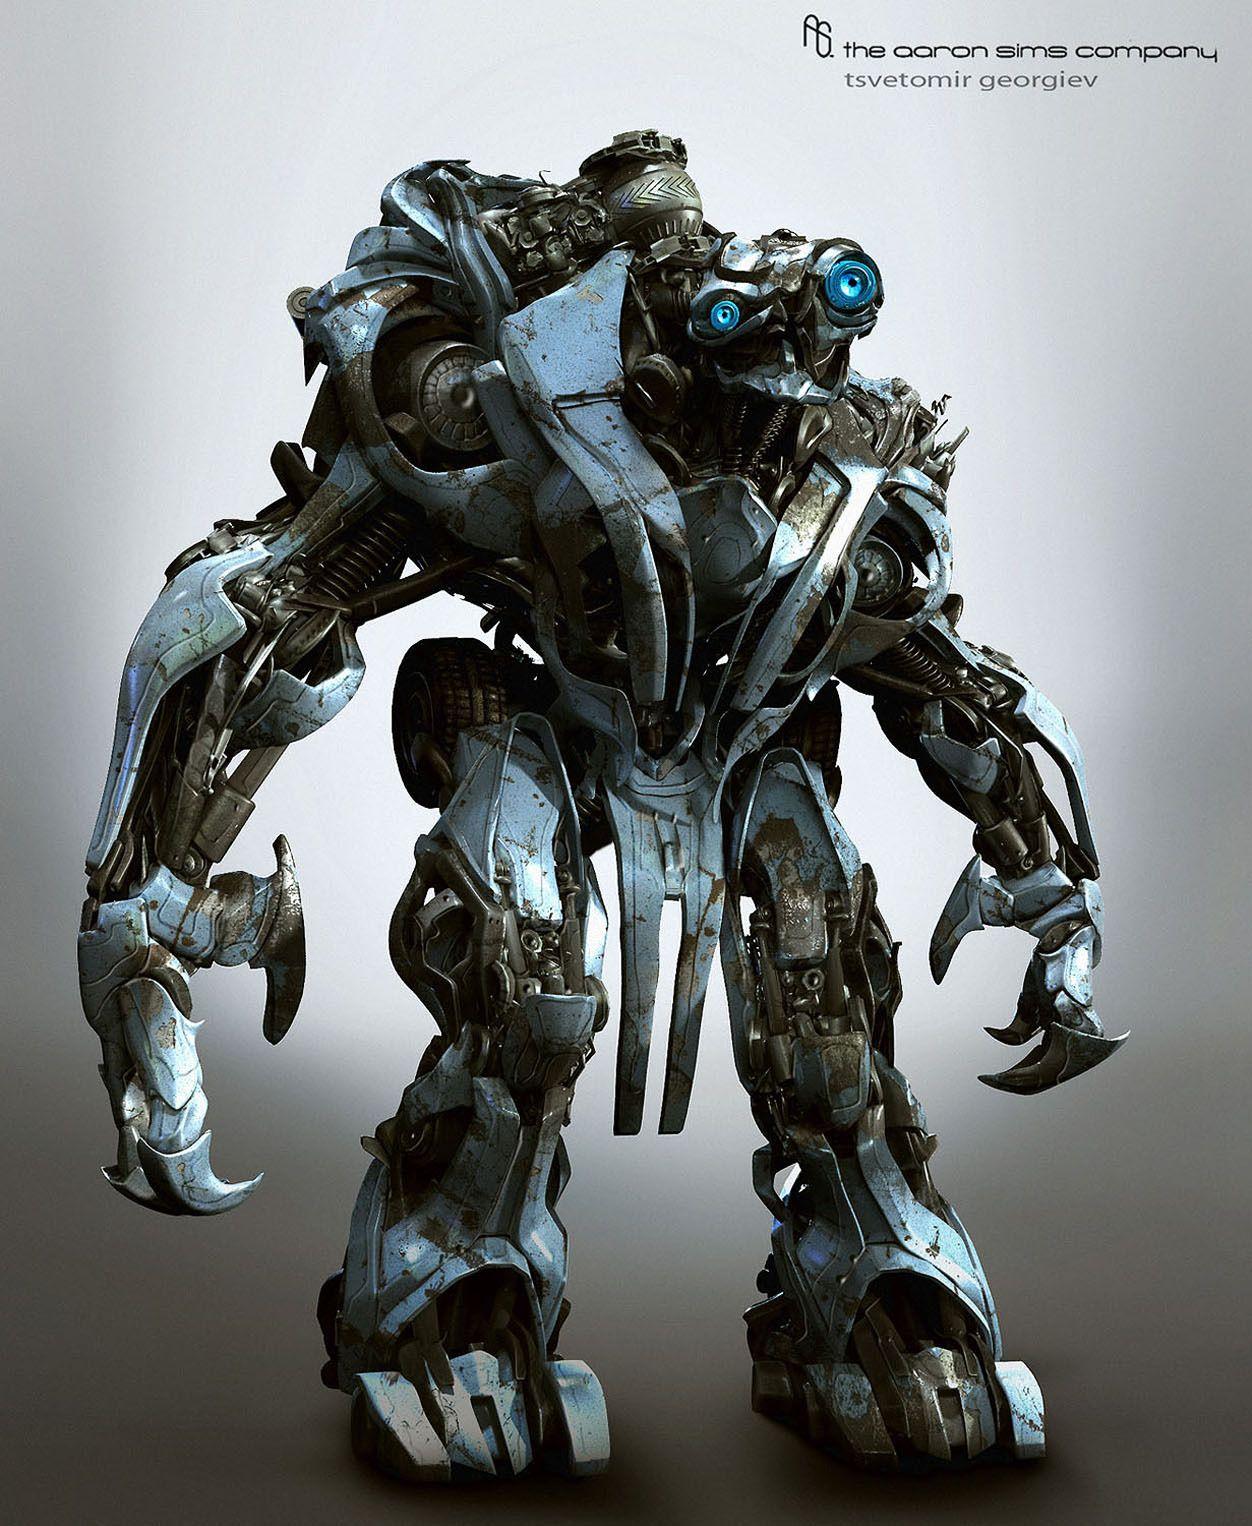 Sci Fi Transformer : Thor sci fi robot digital art  iwallhd